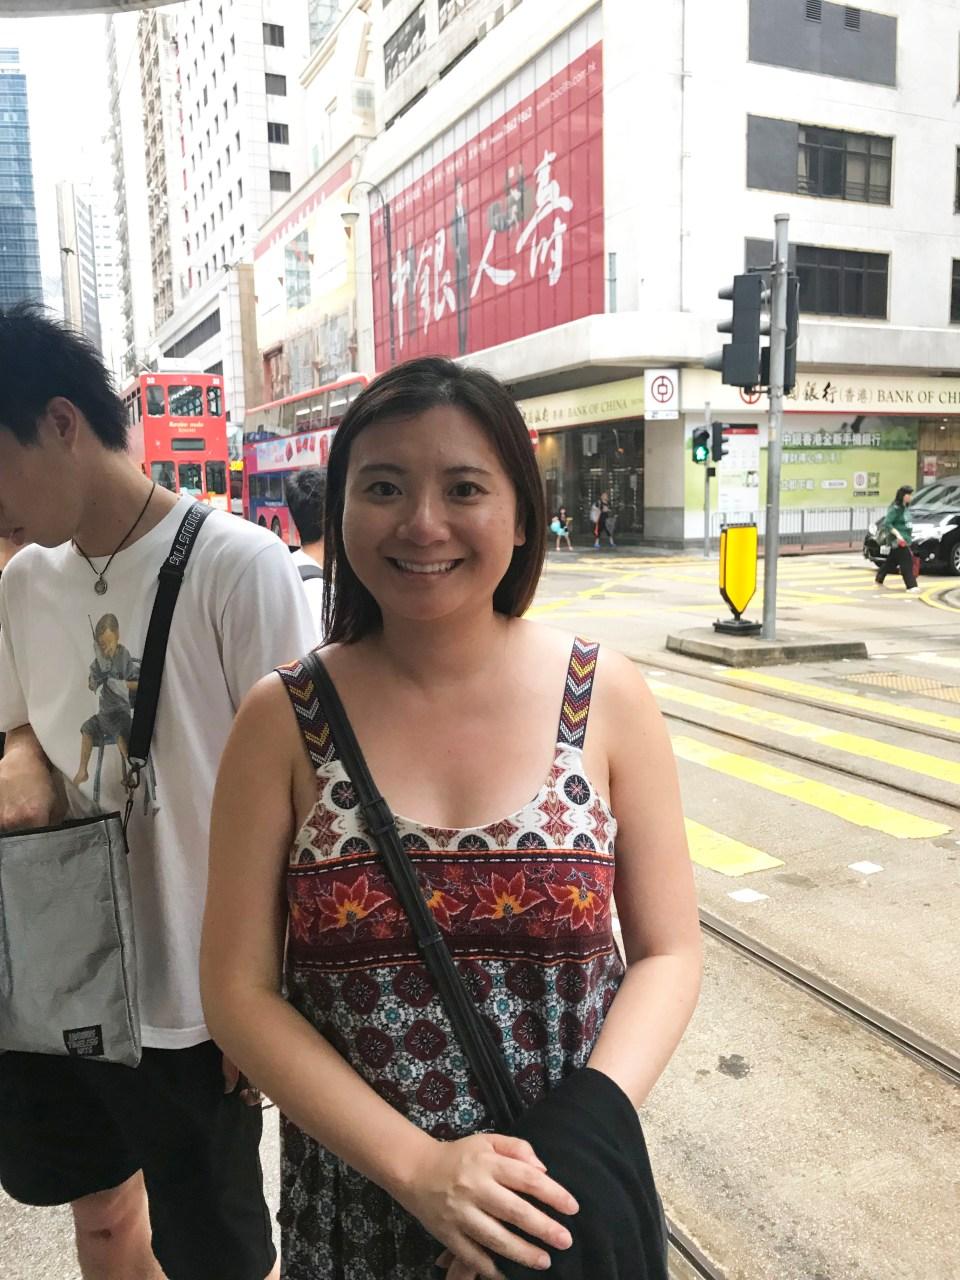 Waiting for HK Tram